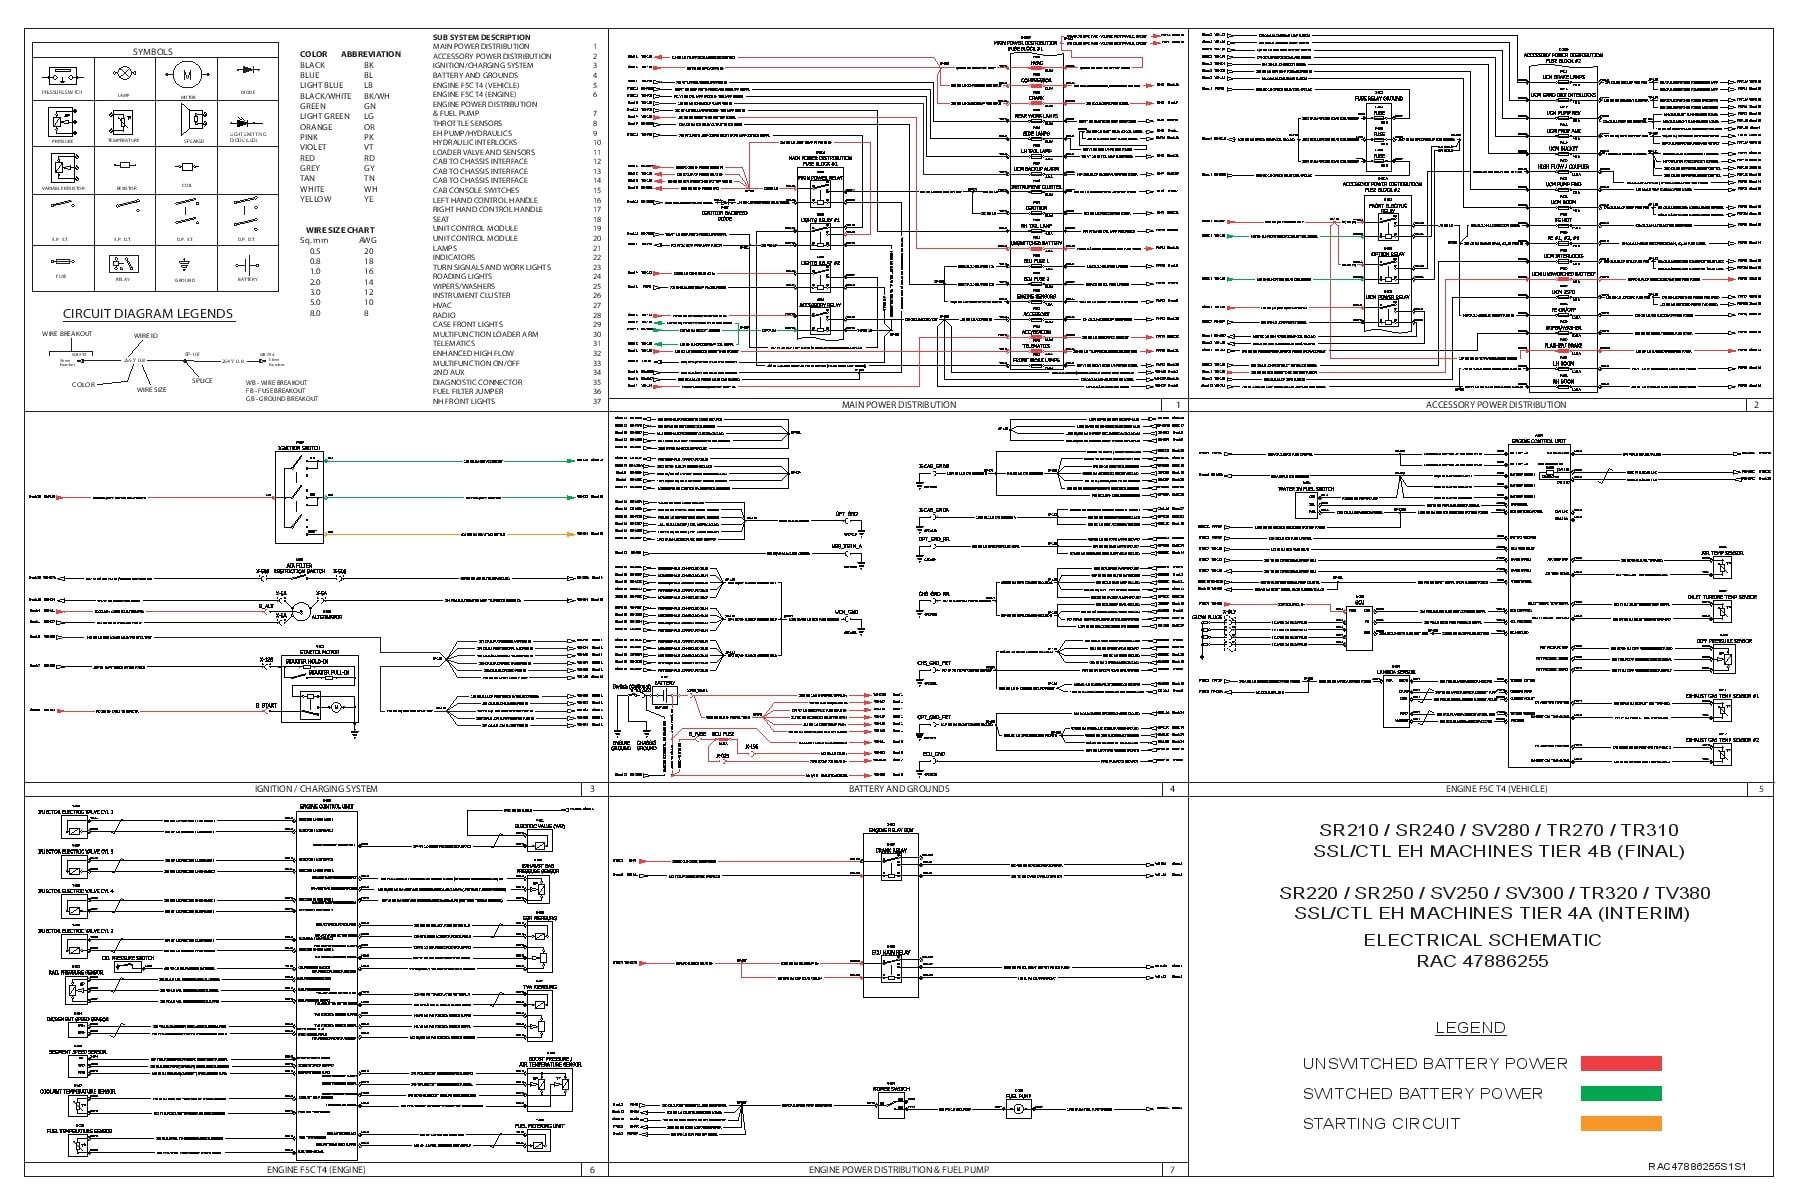 Case SR210 SR240 SV280 TR270 TR310 SR220 SR250 SV250 SV300